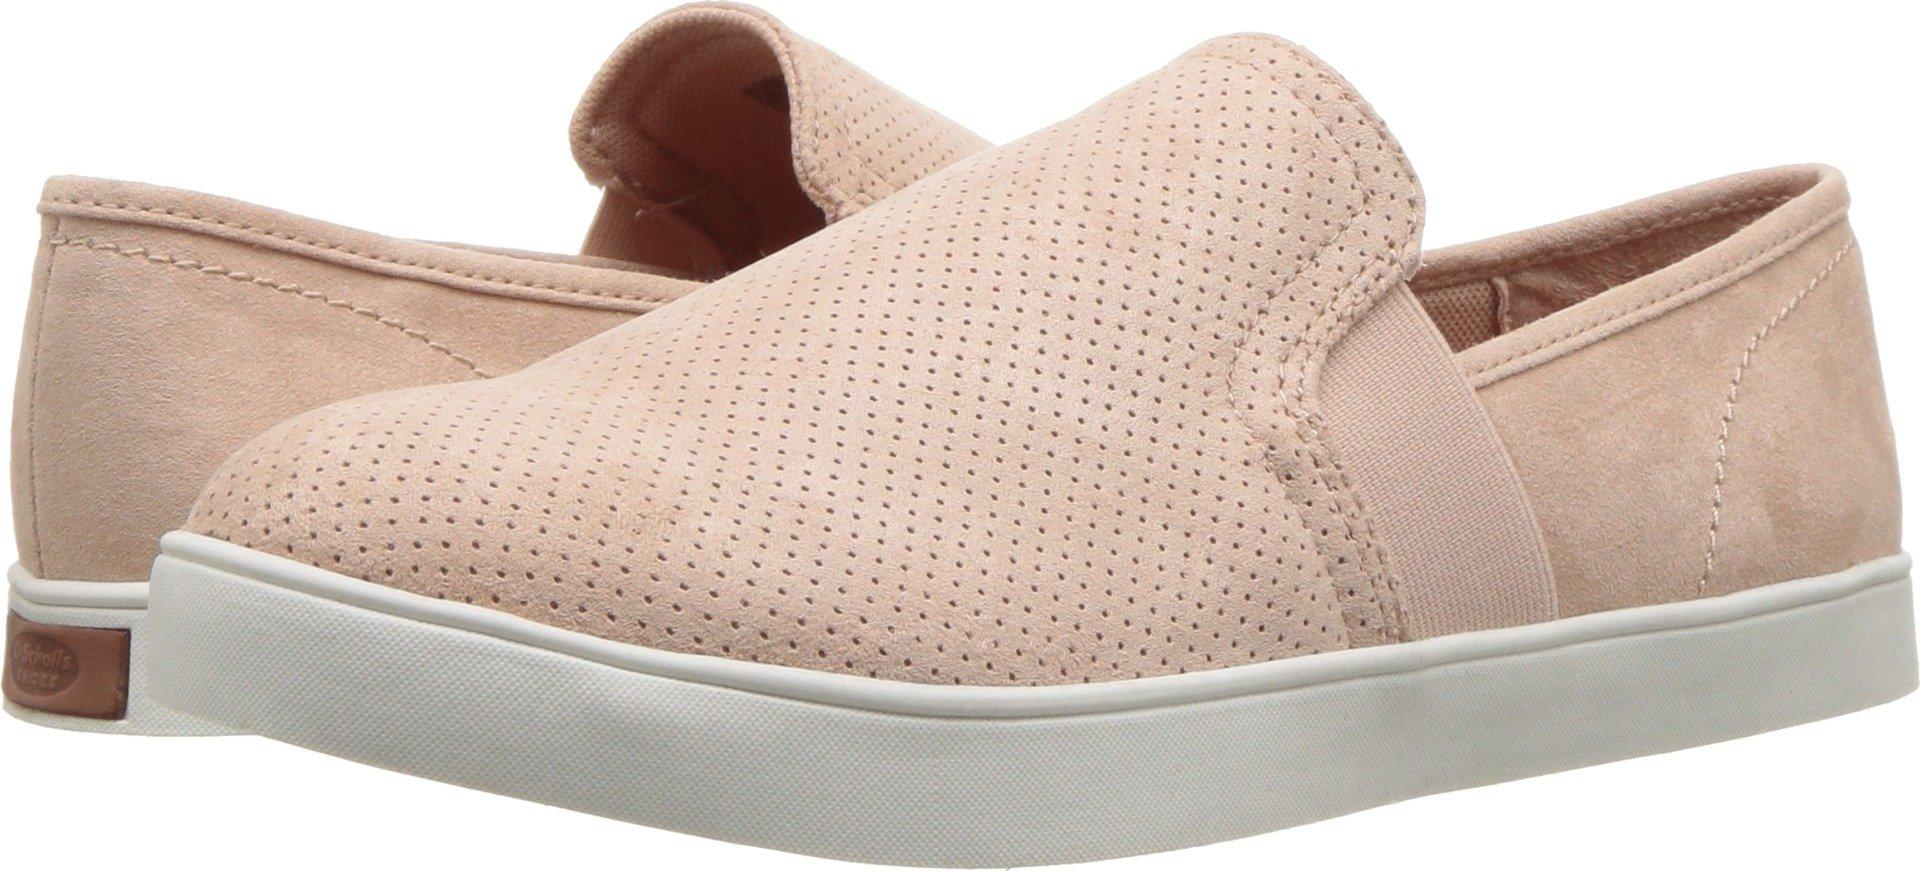 Dr. Scholl's Shoes Women's Luna Sneaker, Maplesugar Blush Microfiber, 11 M US